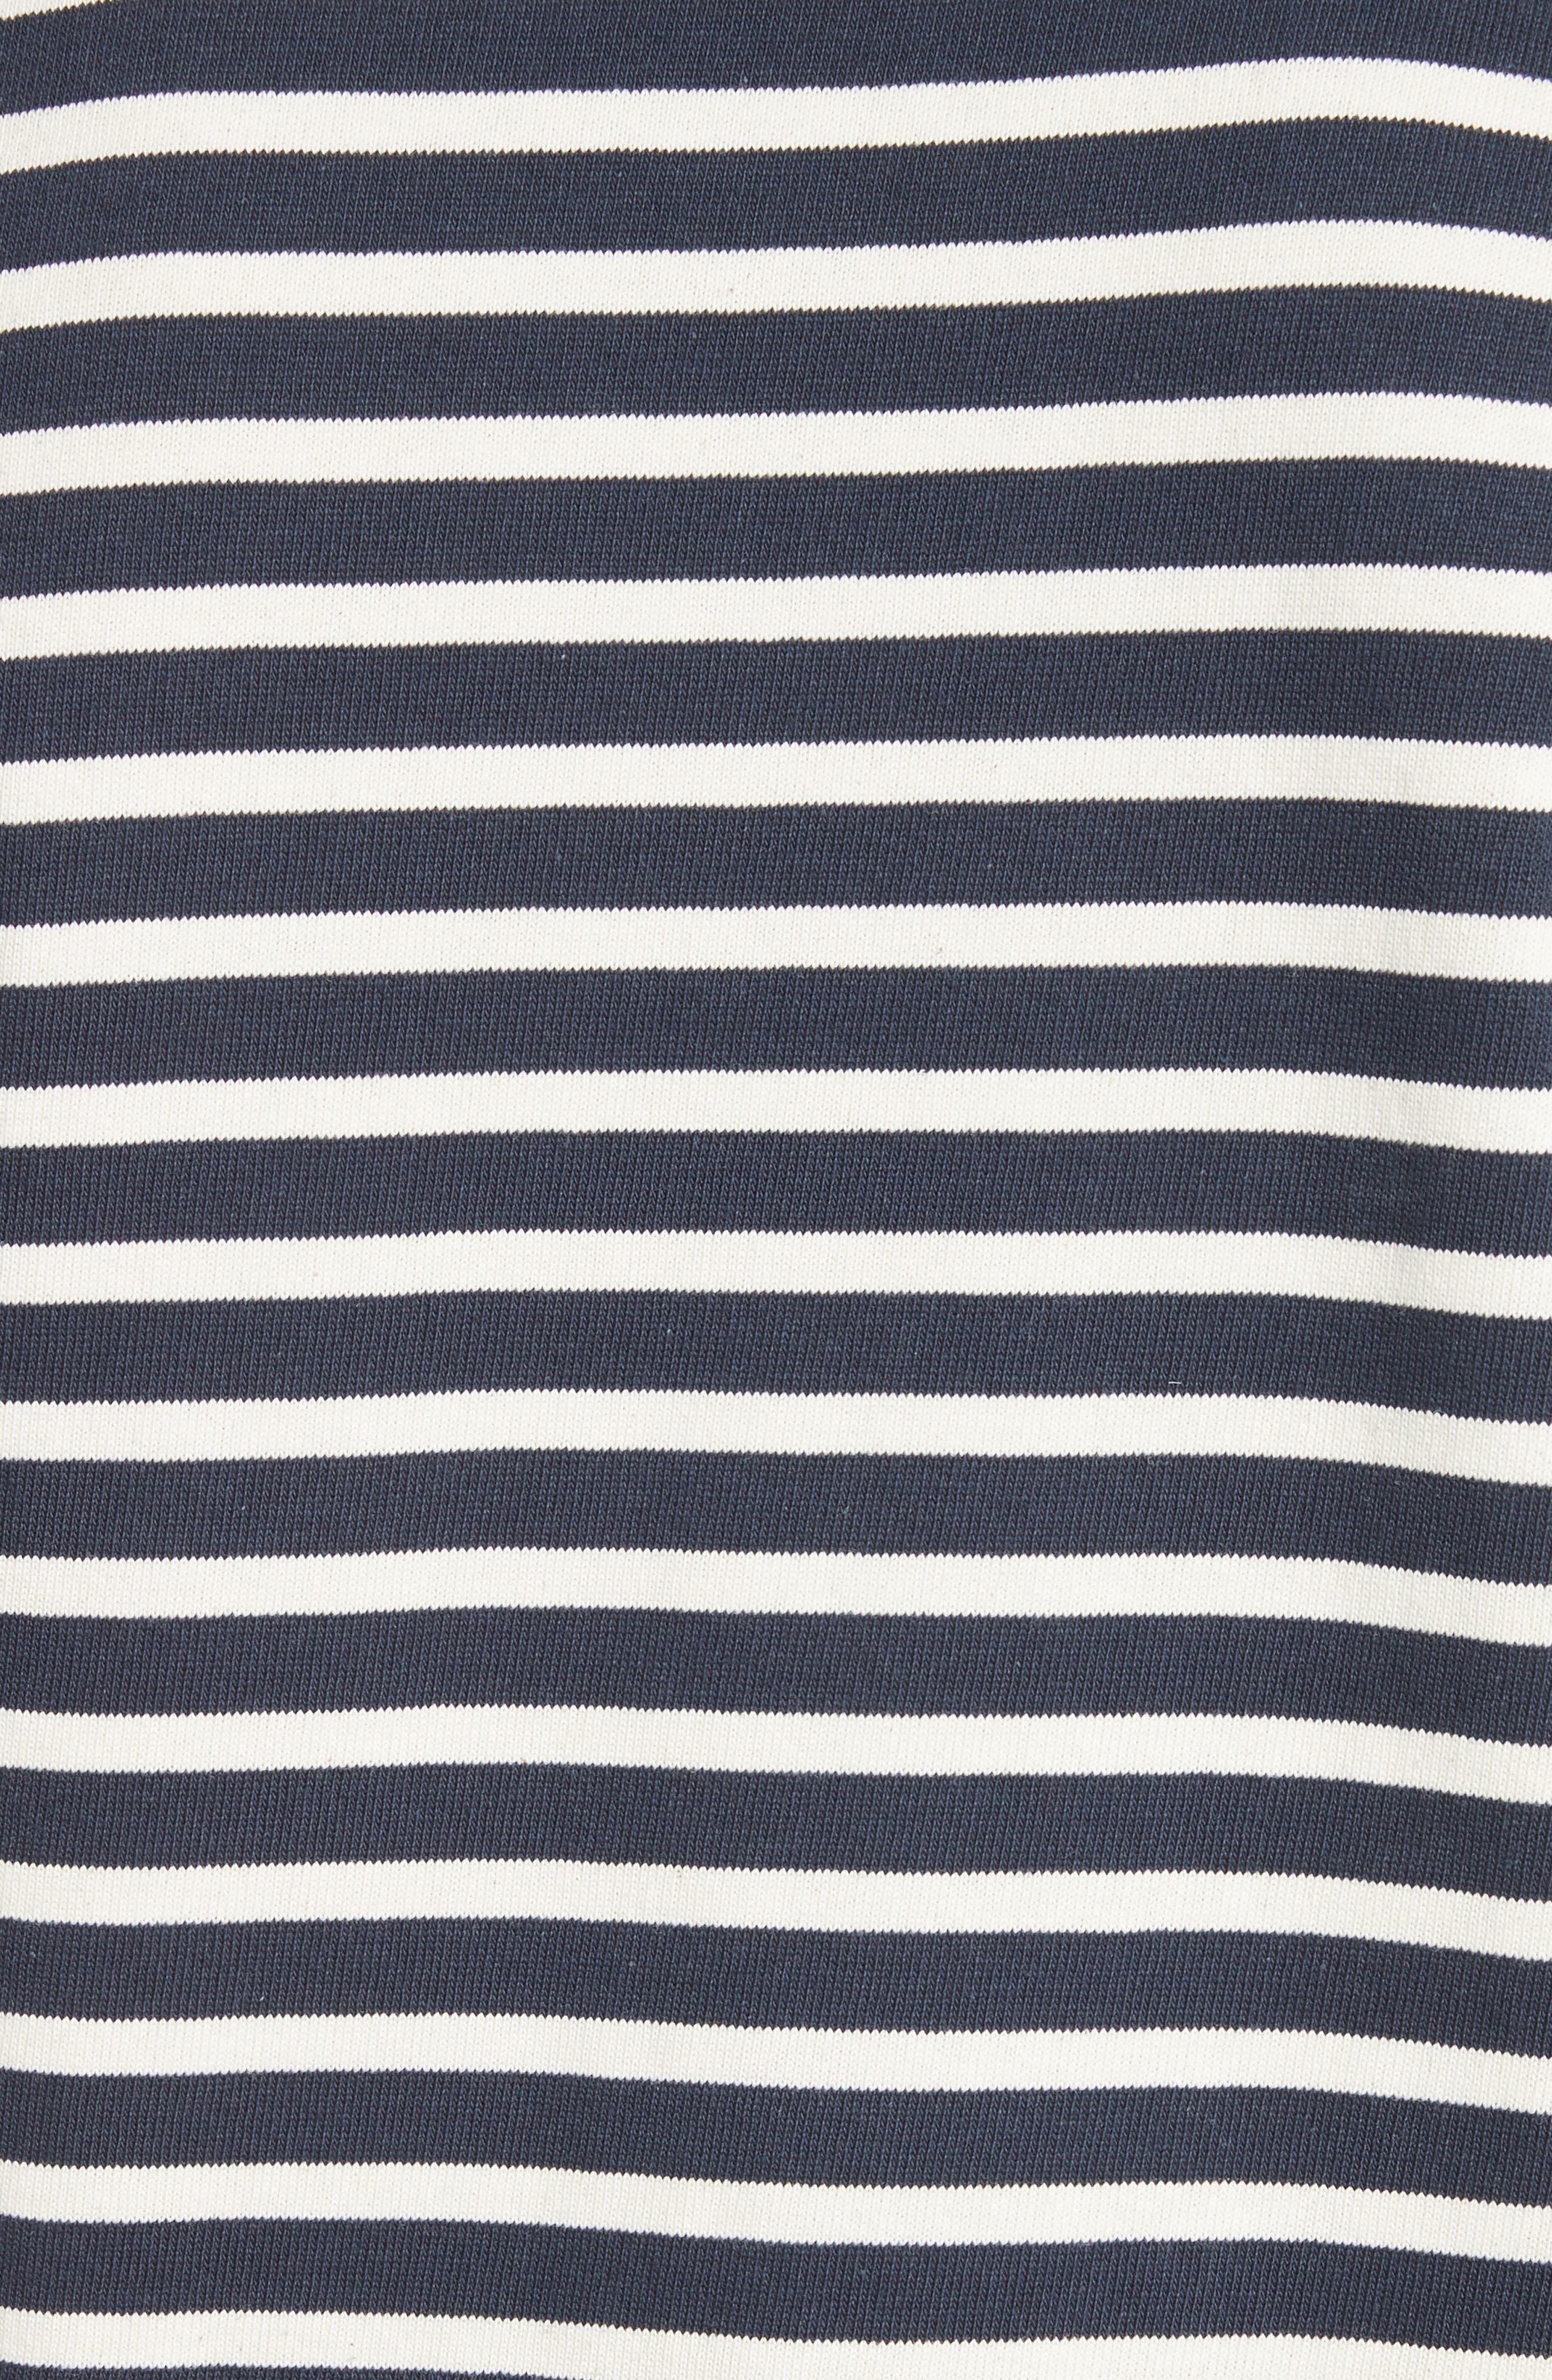 Marinière Matt Stripe Long Sleeve T-Shirt,                             Alternate thumbnail 5, color,                             DARK NAVY